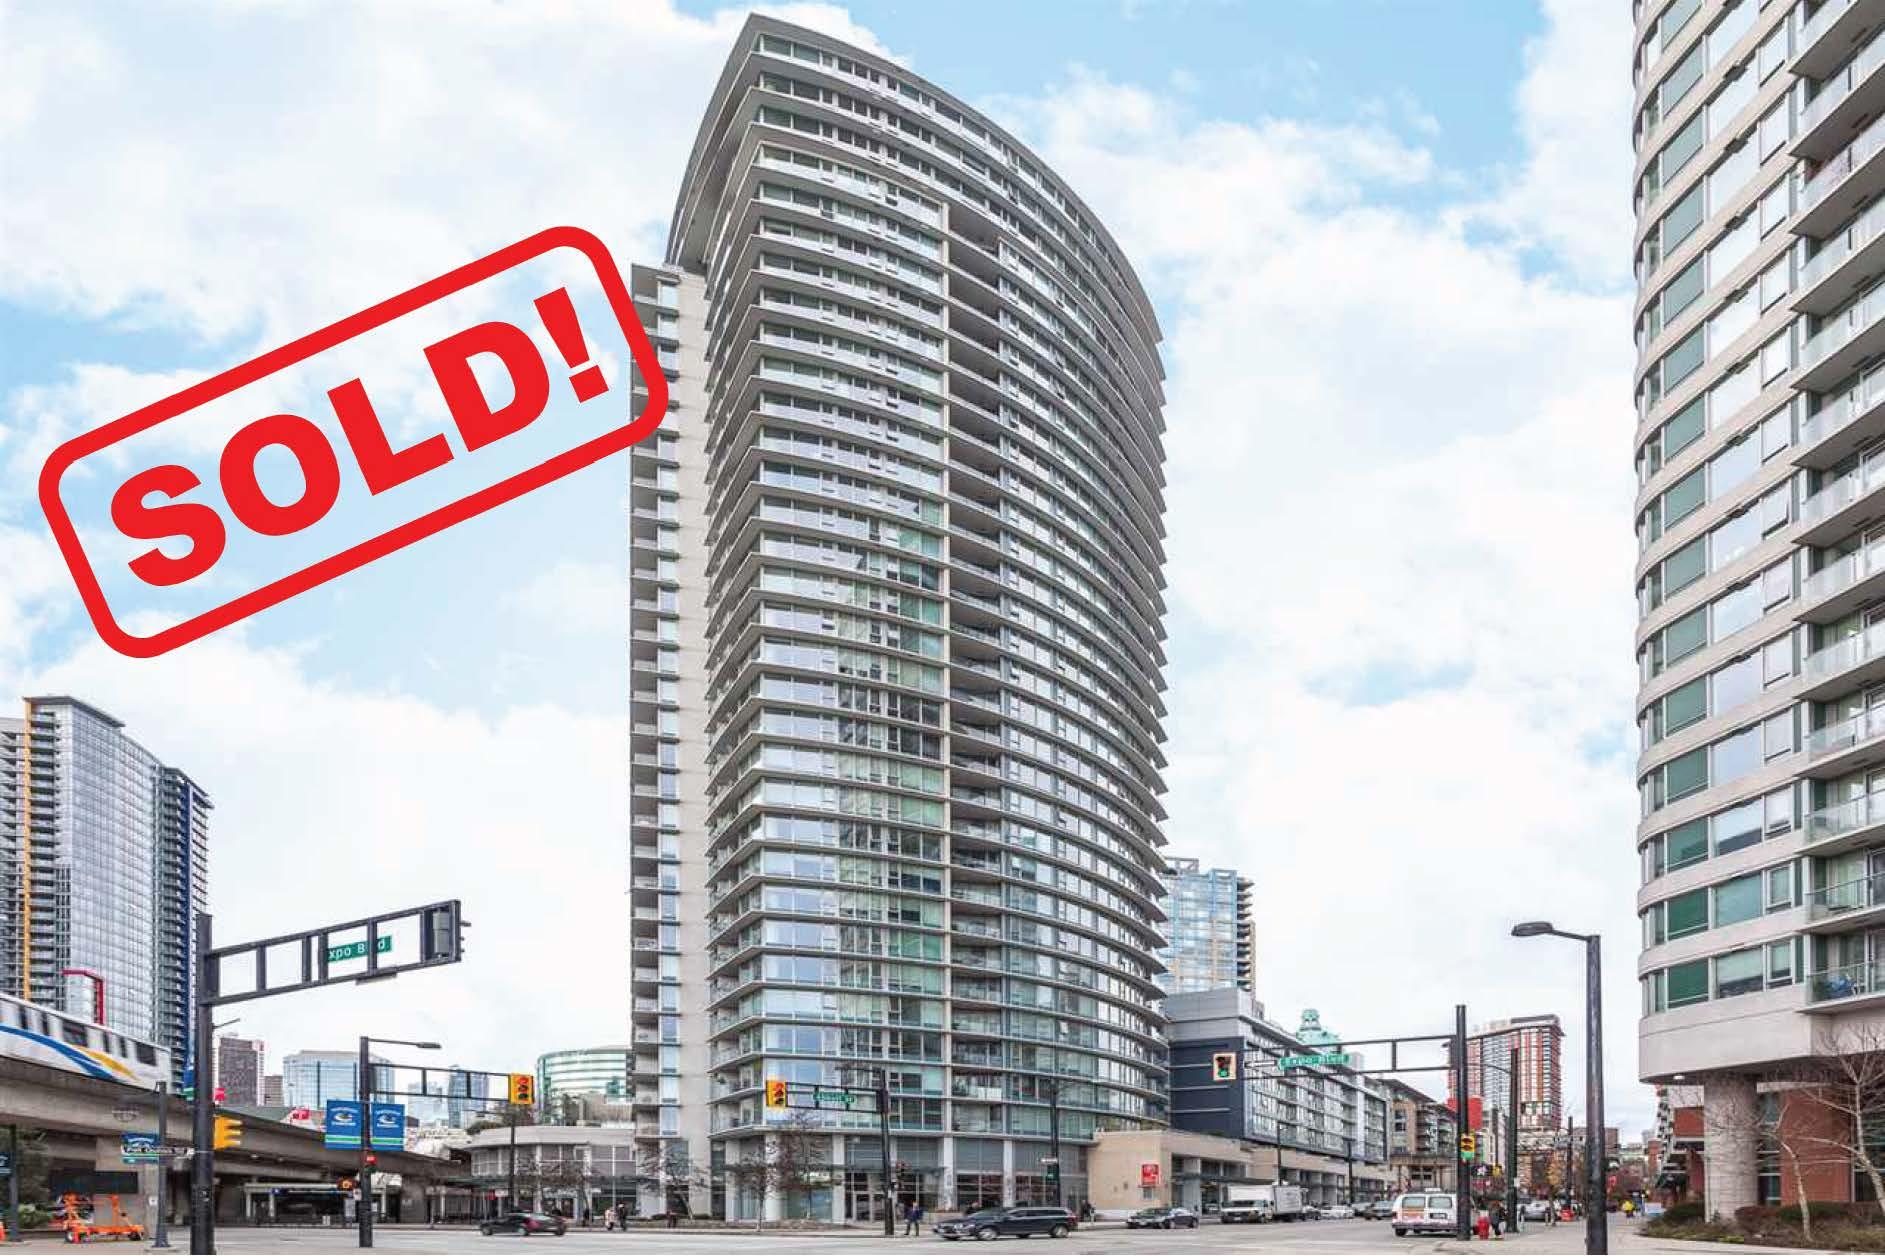 302-689 Abbott Street   sold for: $849,000  2 Bed | 2 Bath | 935 SF